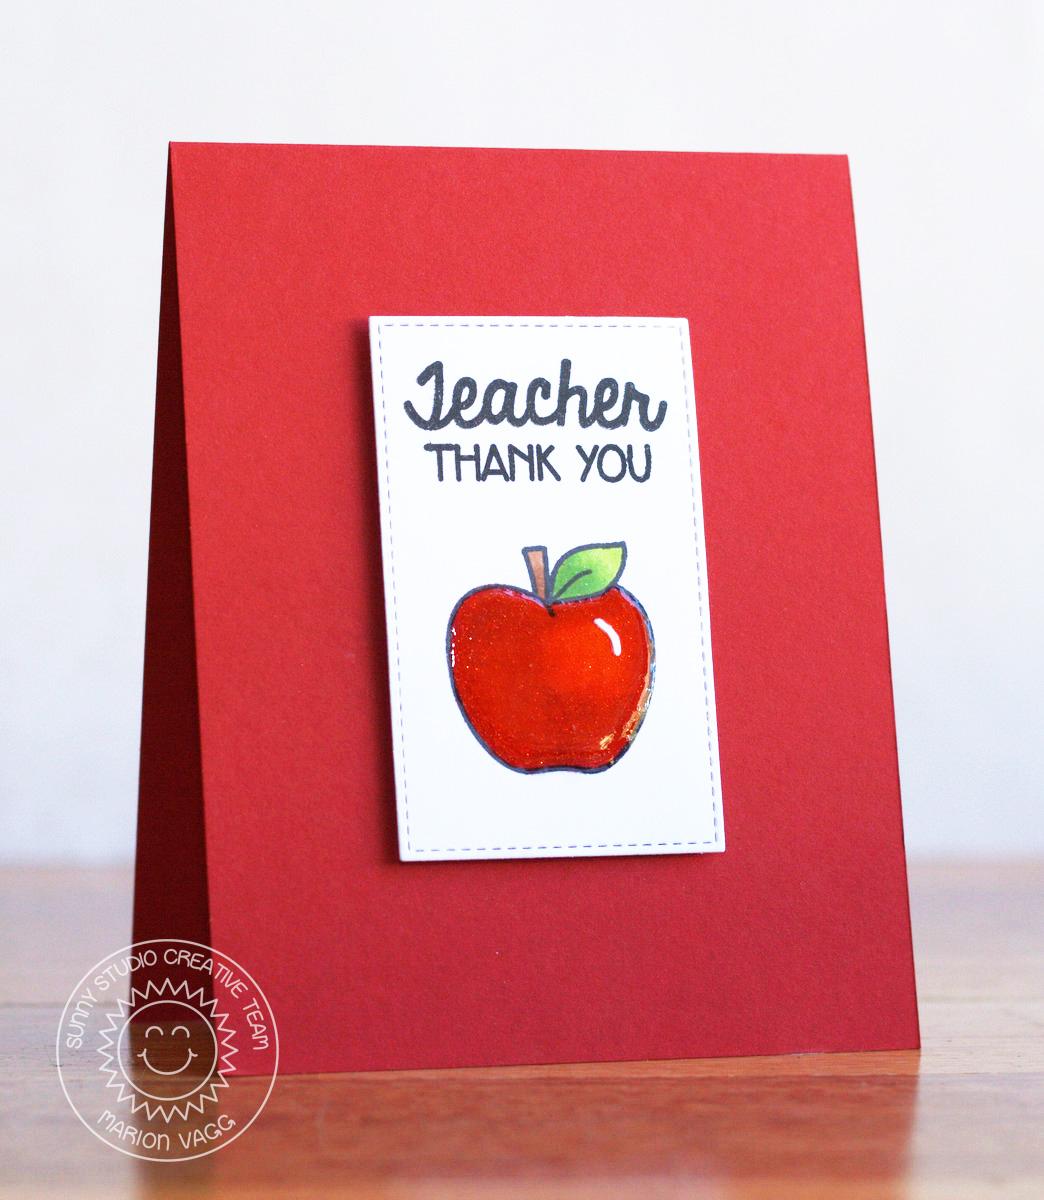 SS Teacher Thank You | Marion Vagg